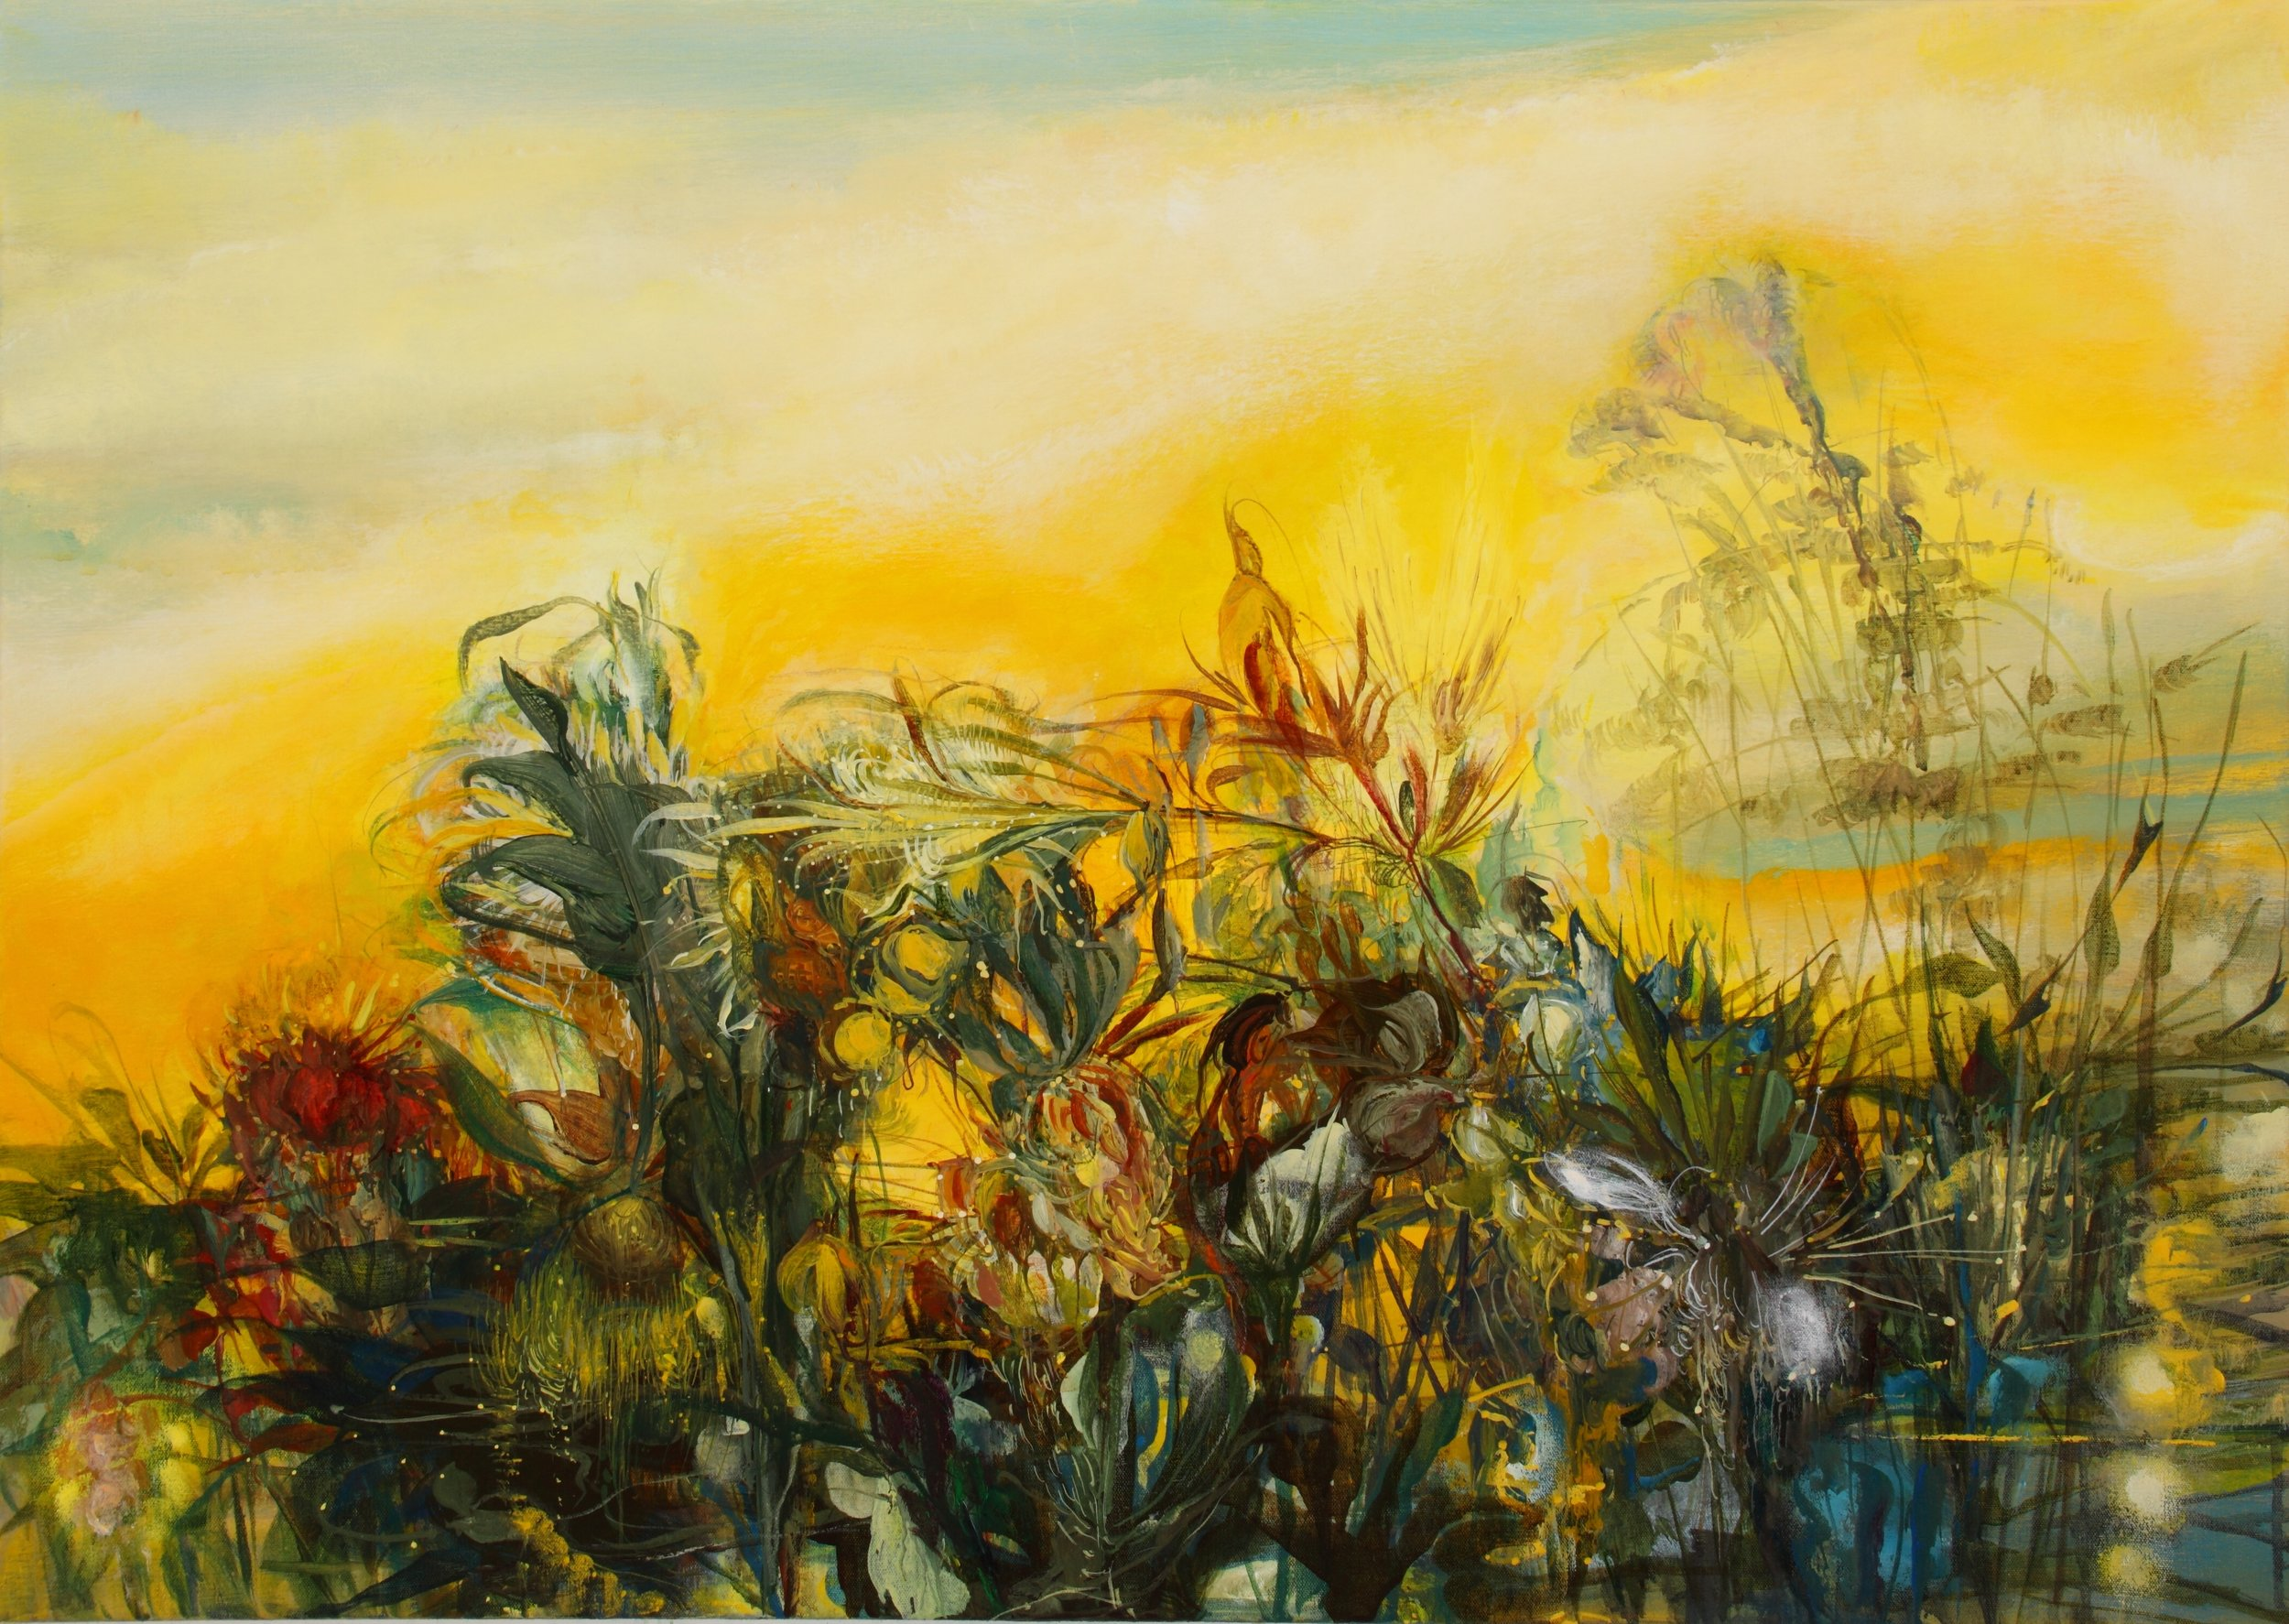 Magic Gold Full Sun, 2011, 30 x 42 inches, acrylic on canvas